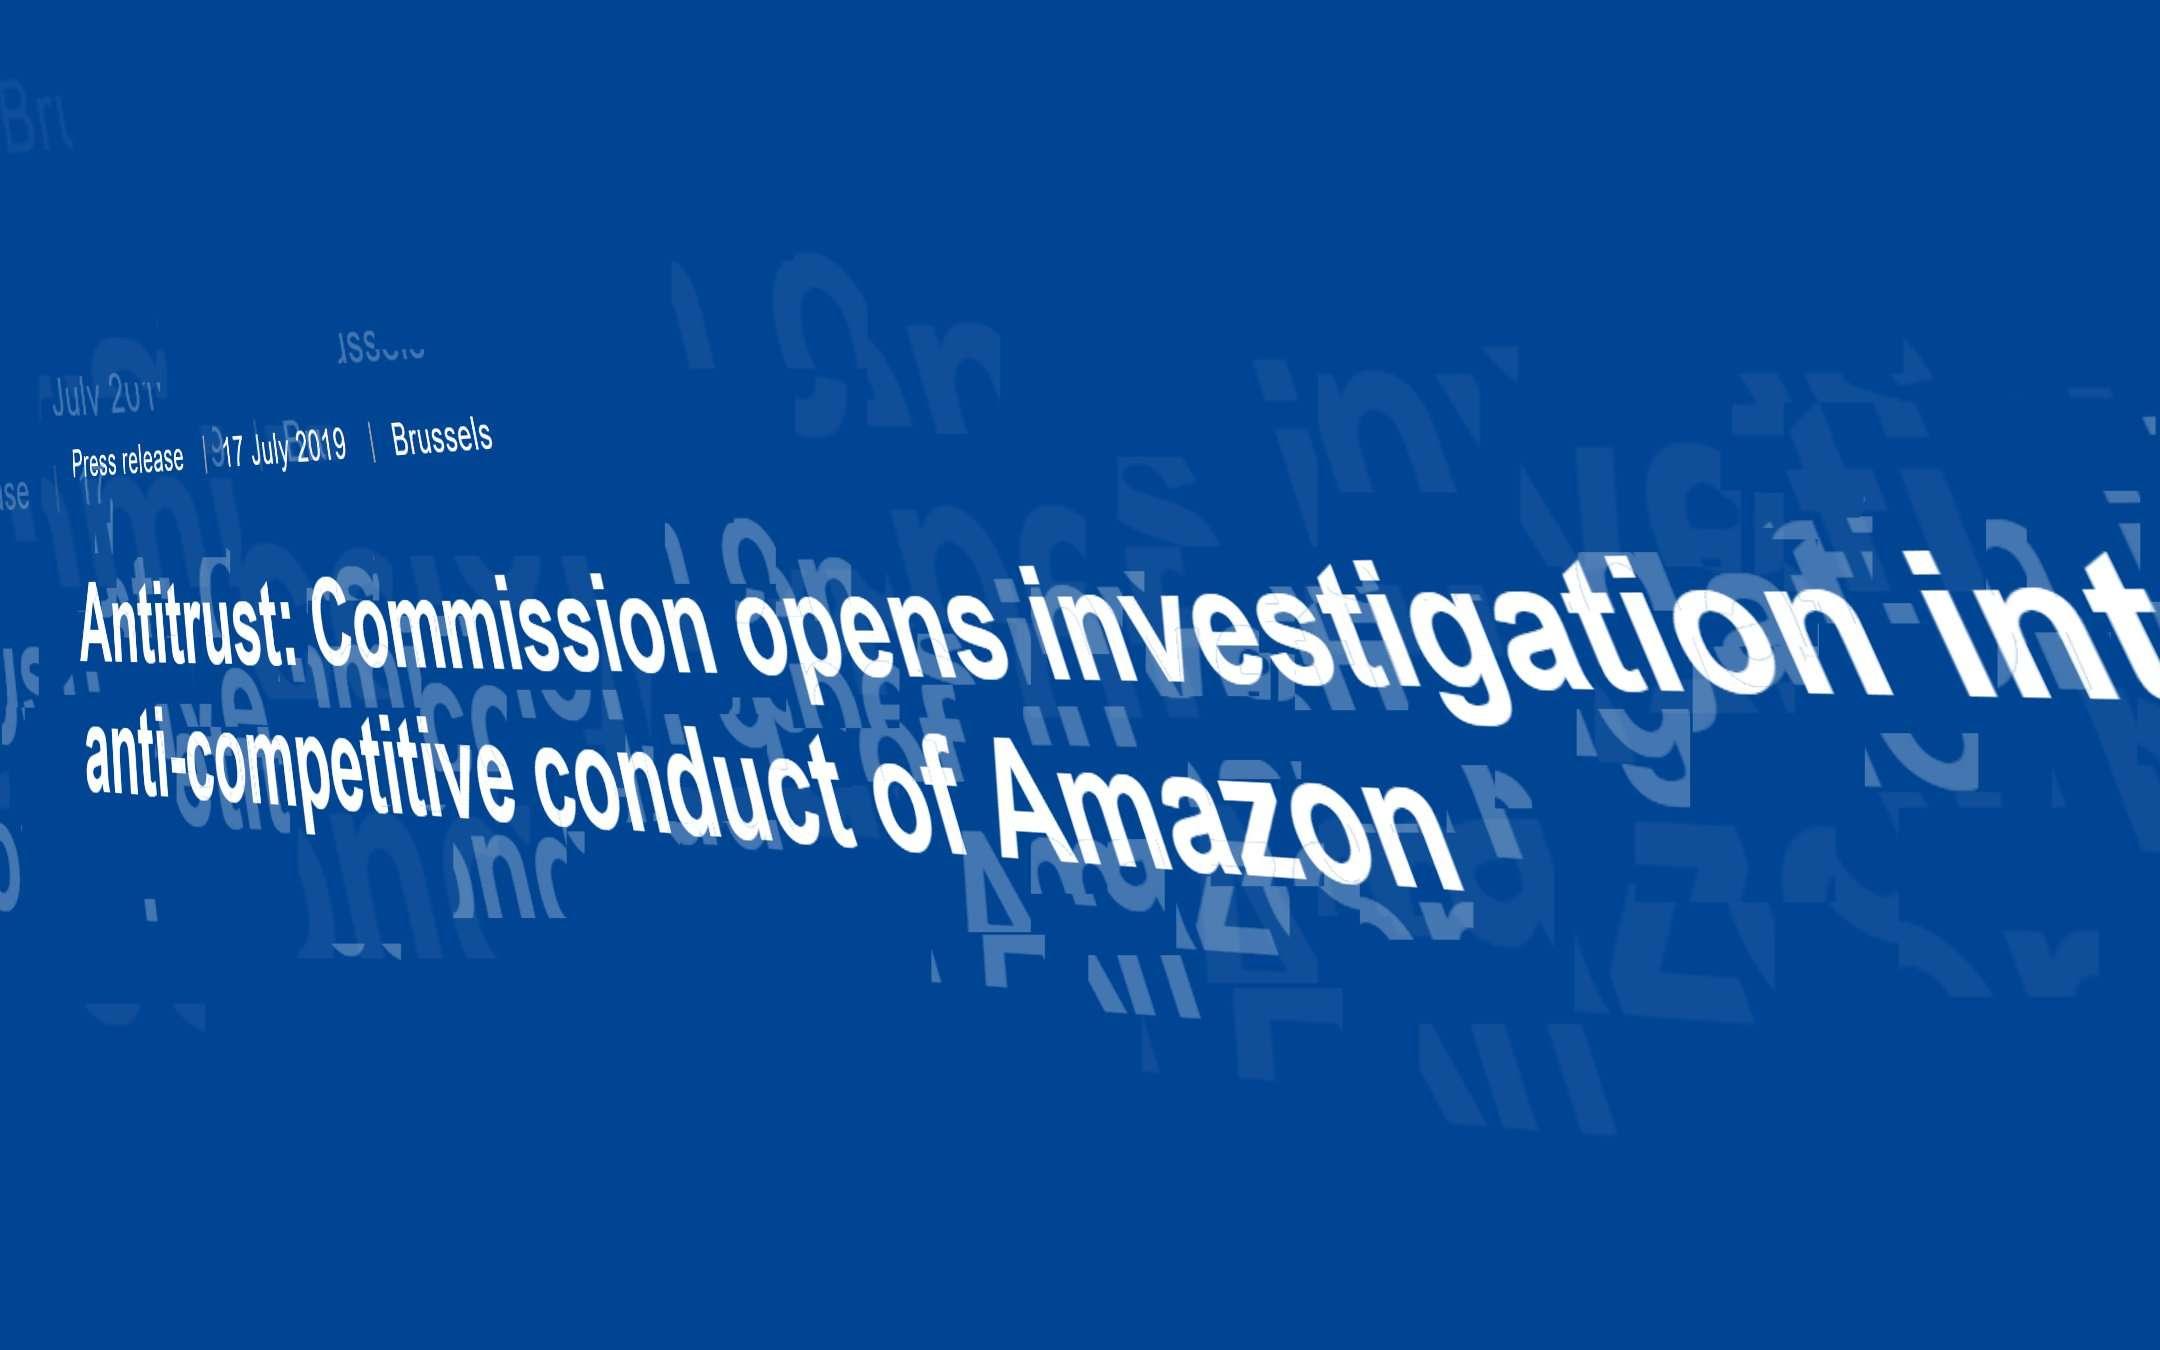 La Commissione Europea indaga su Amazon